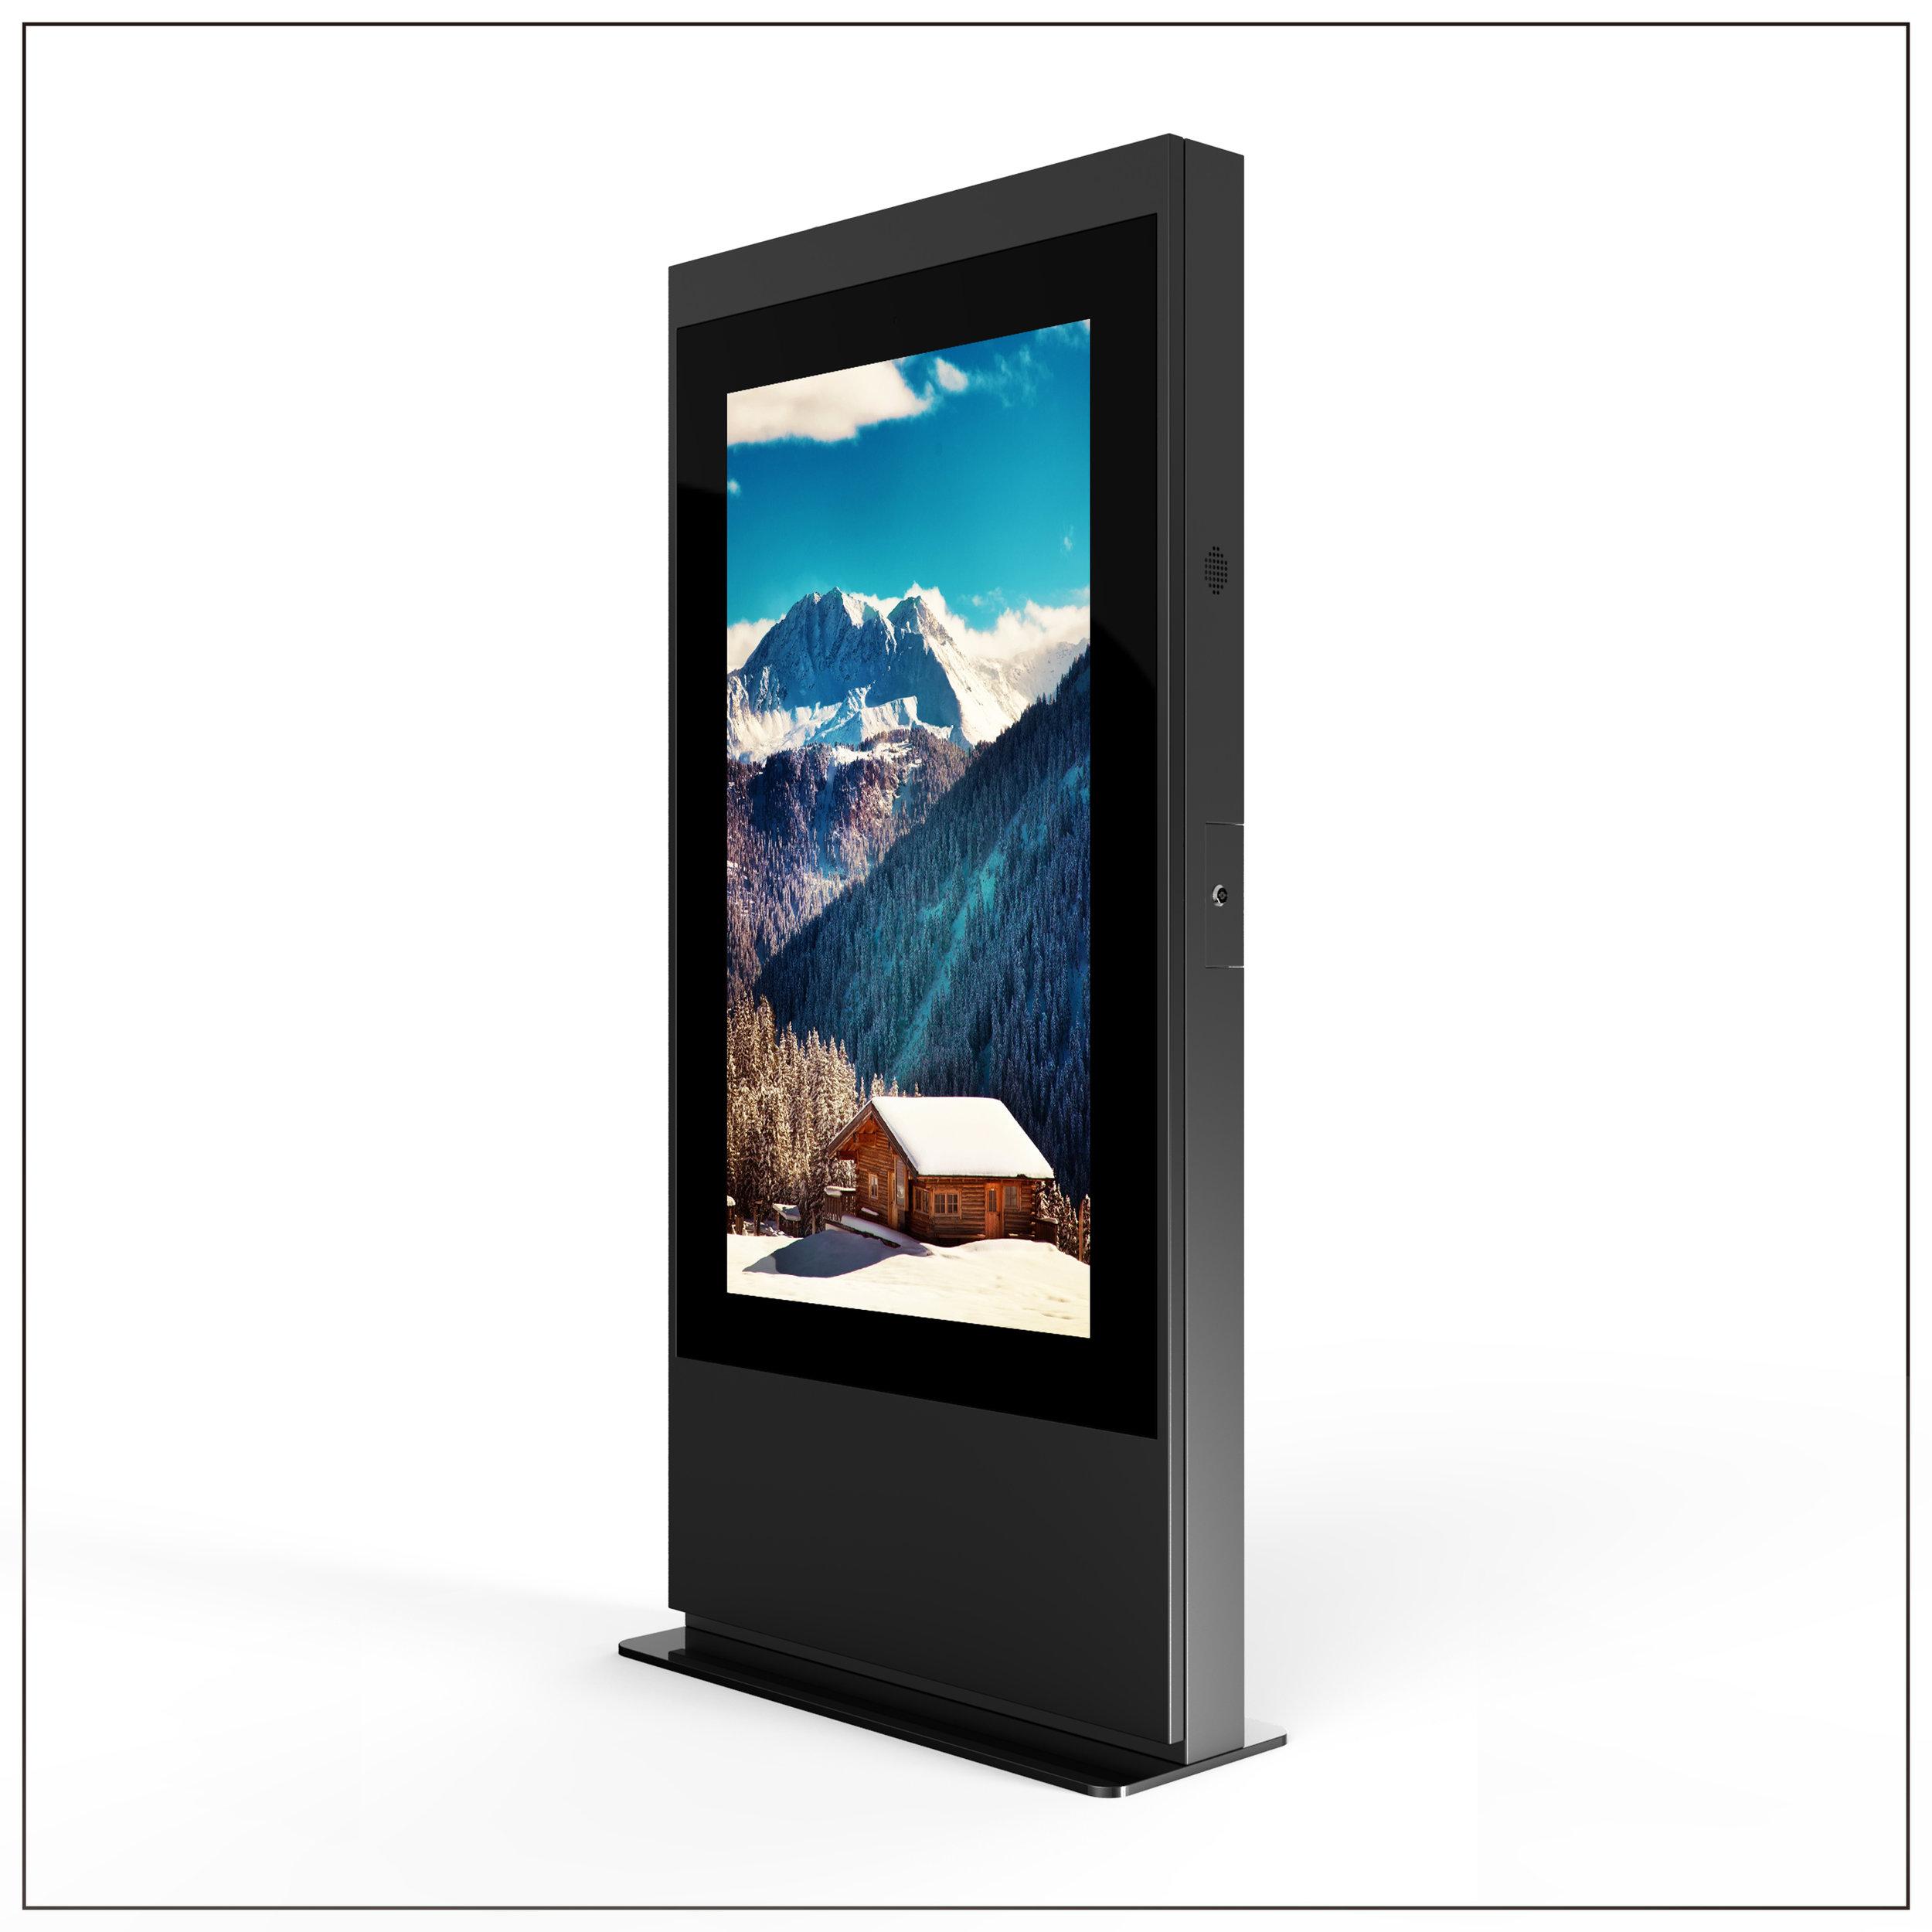 43 / 55 / 65 inch Outdoor High Brightness LCD Displays - Panel Size: 43, 55, 65 inchBrightness : 3000 nitResolution: 1920 × 1080